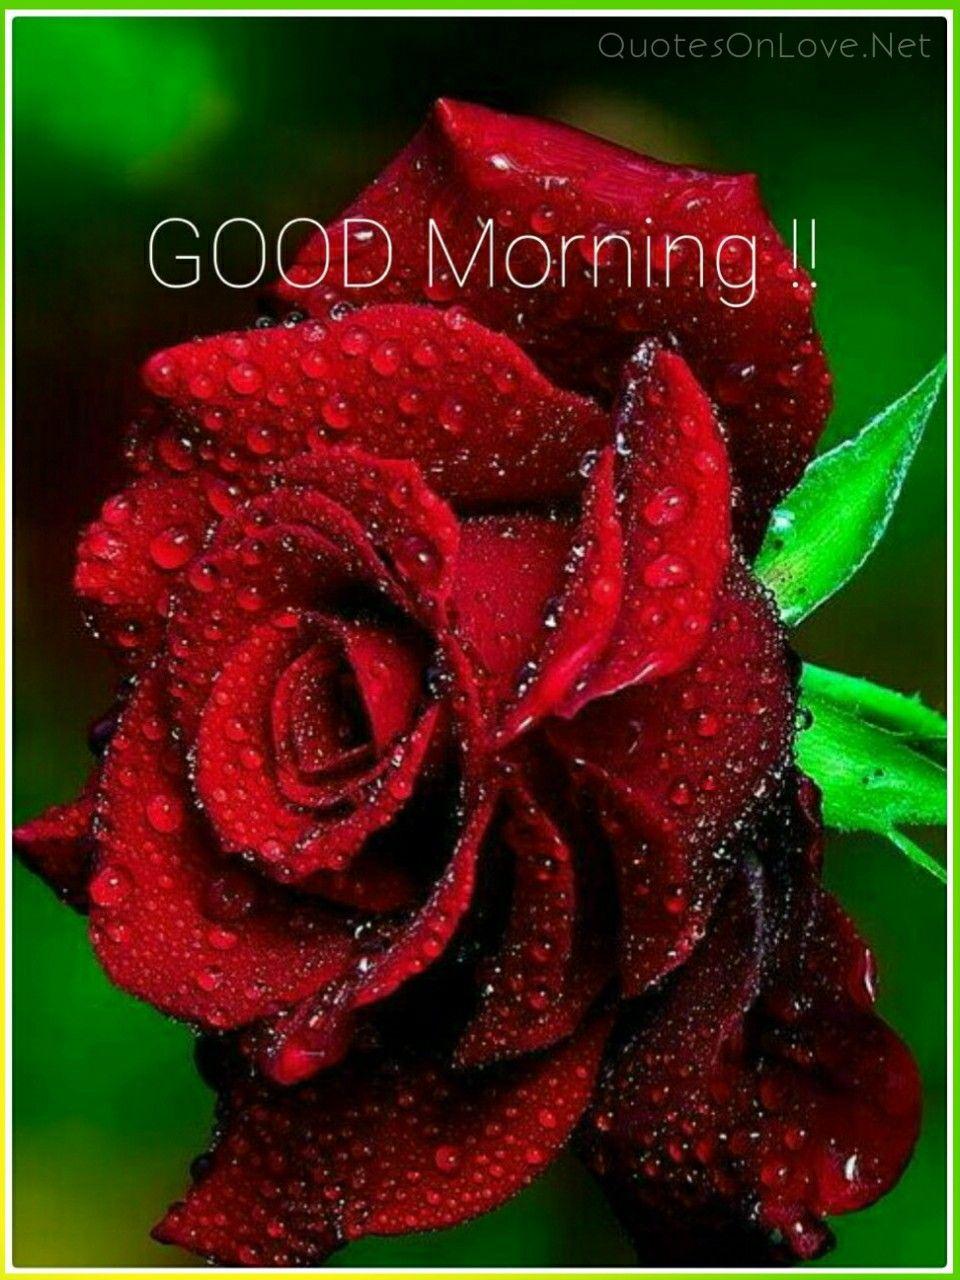 Good morning goodmorningimages goodmorningpics quotes